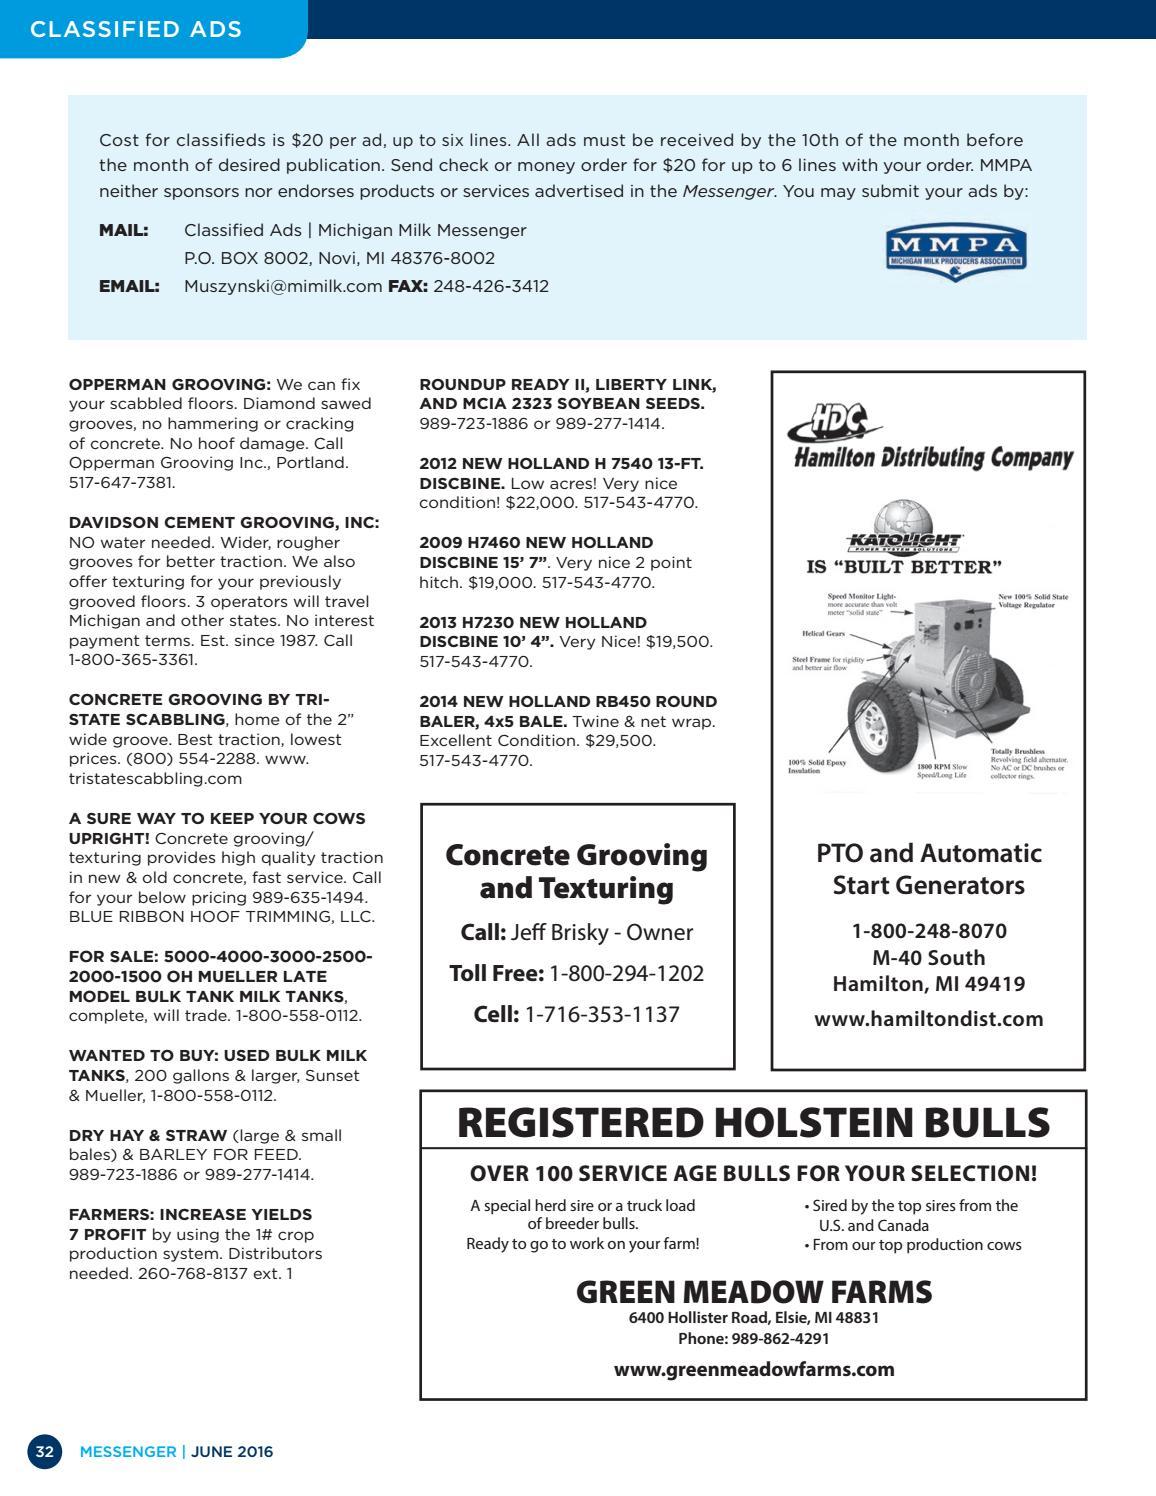 Michigan Milk Messenger: June 2016 by Michigan Milk